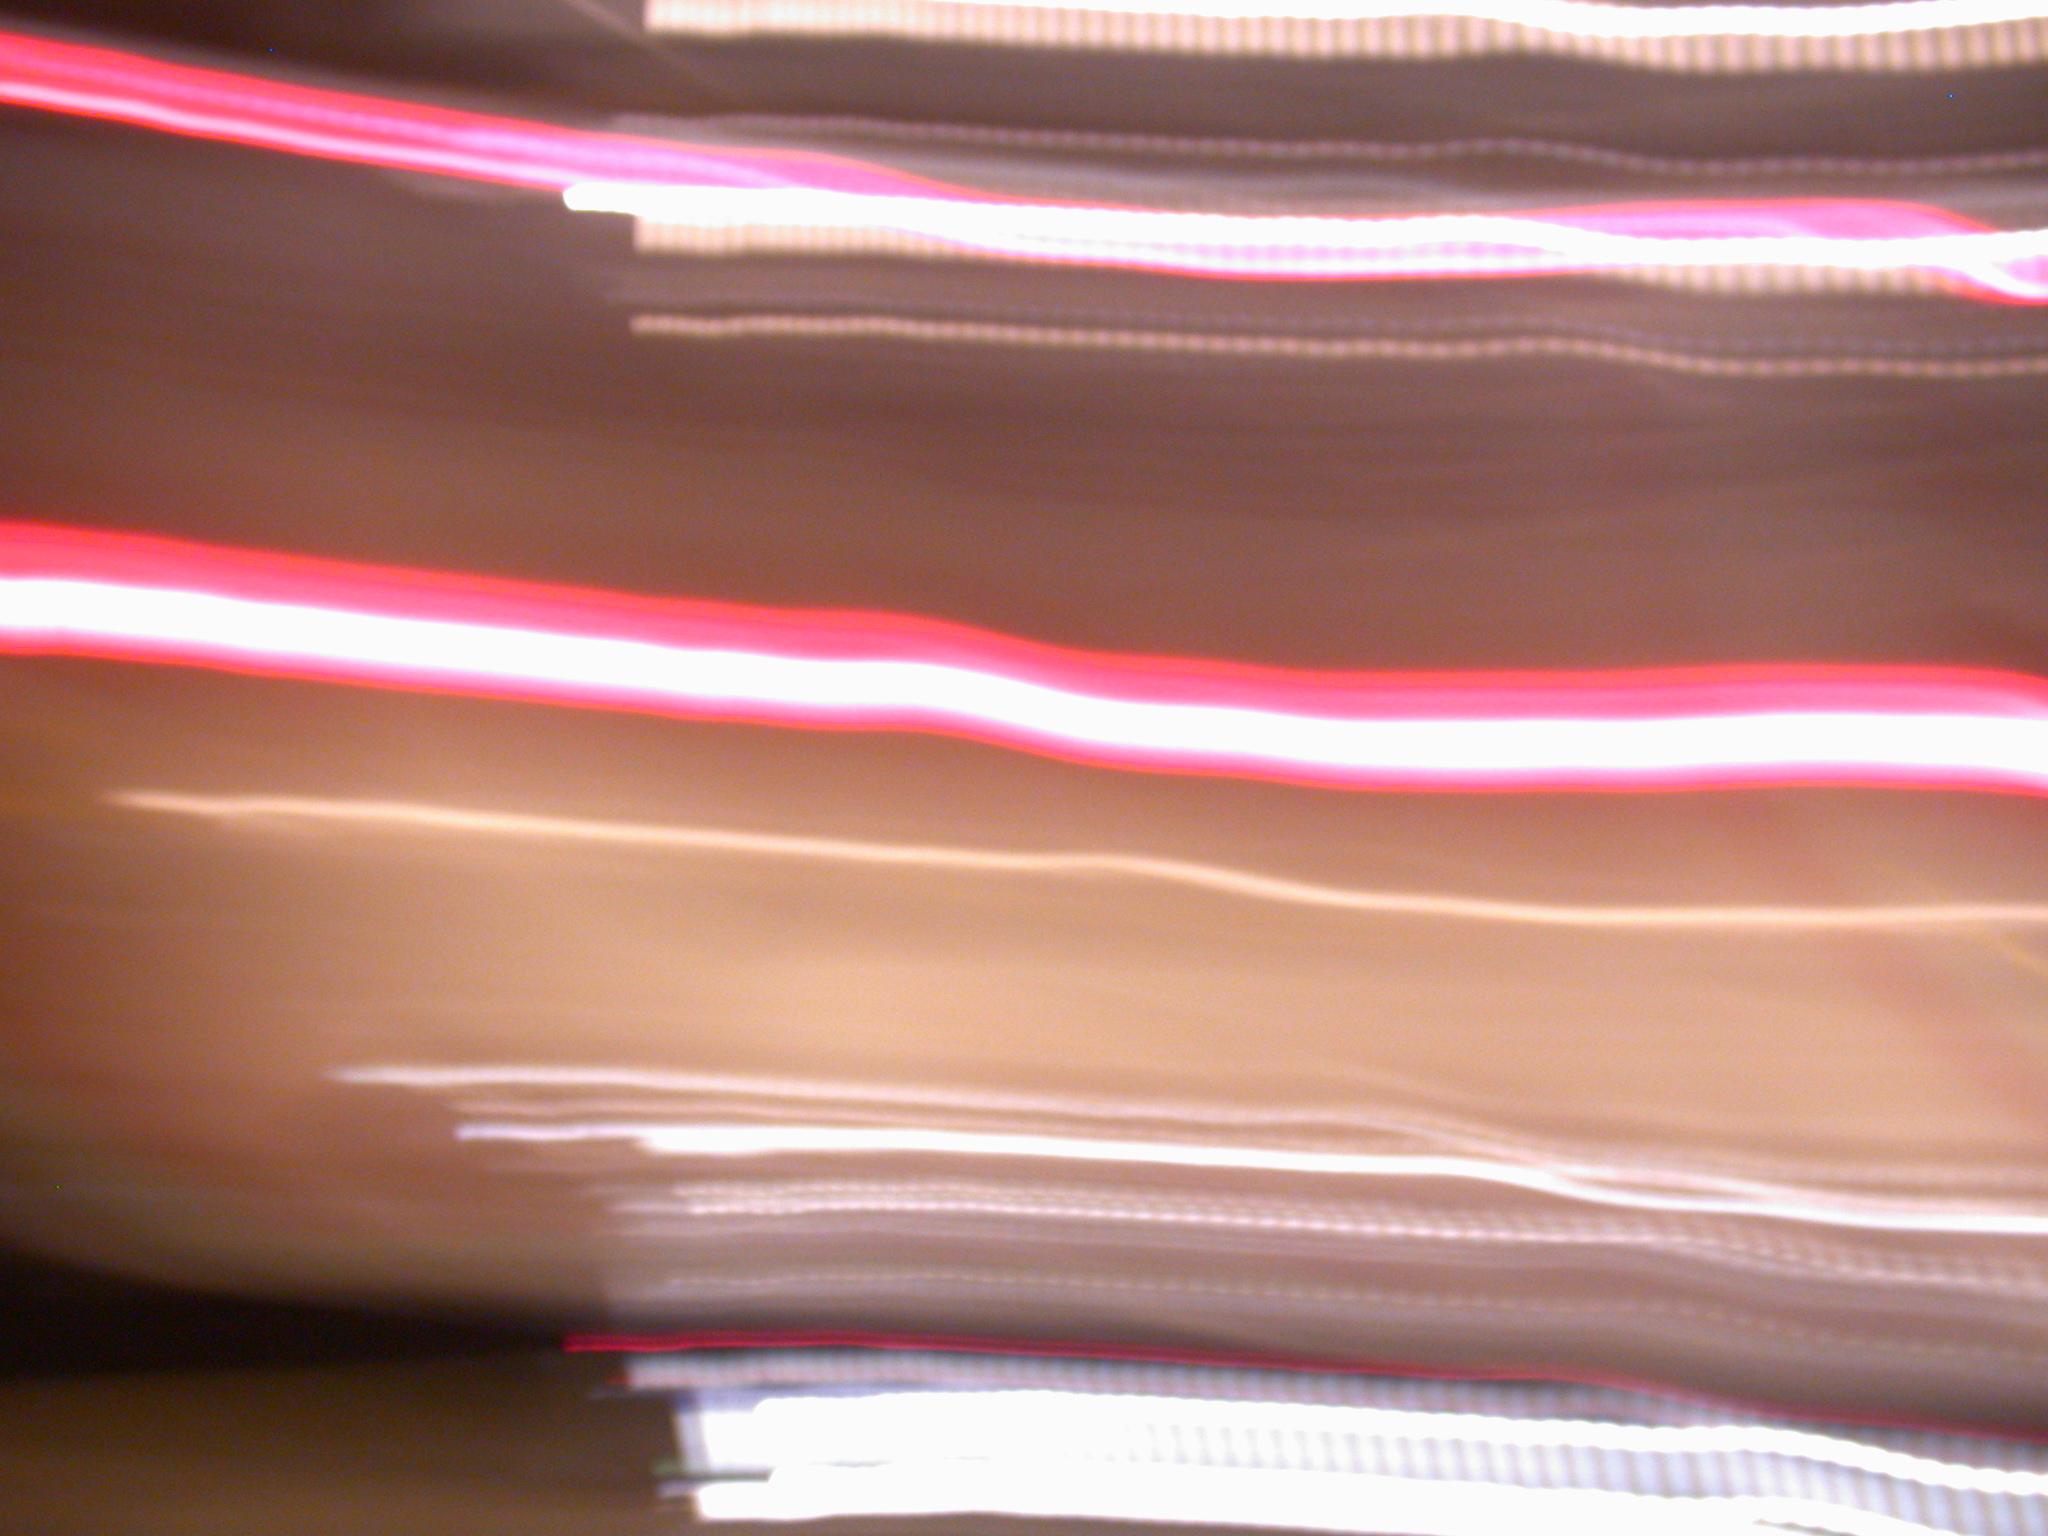 stripes light fast speed blur effect motion